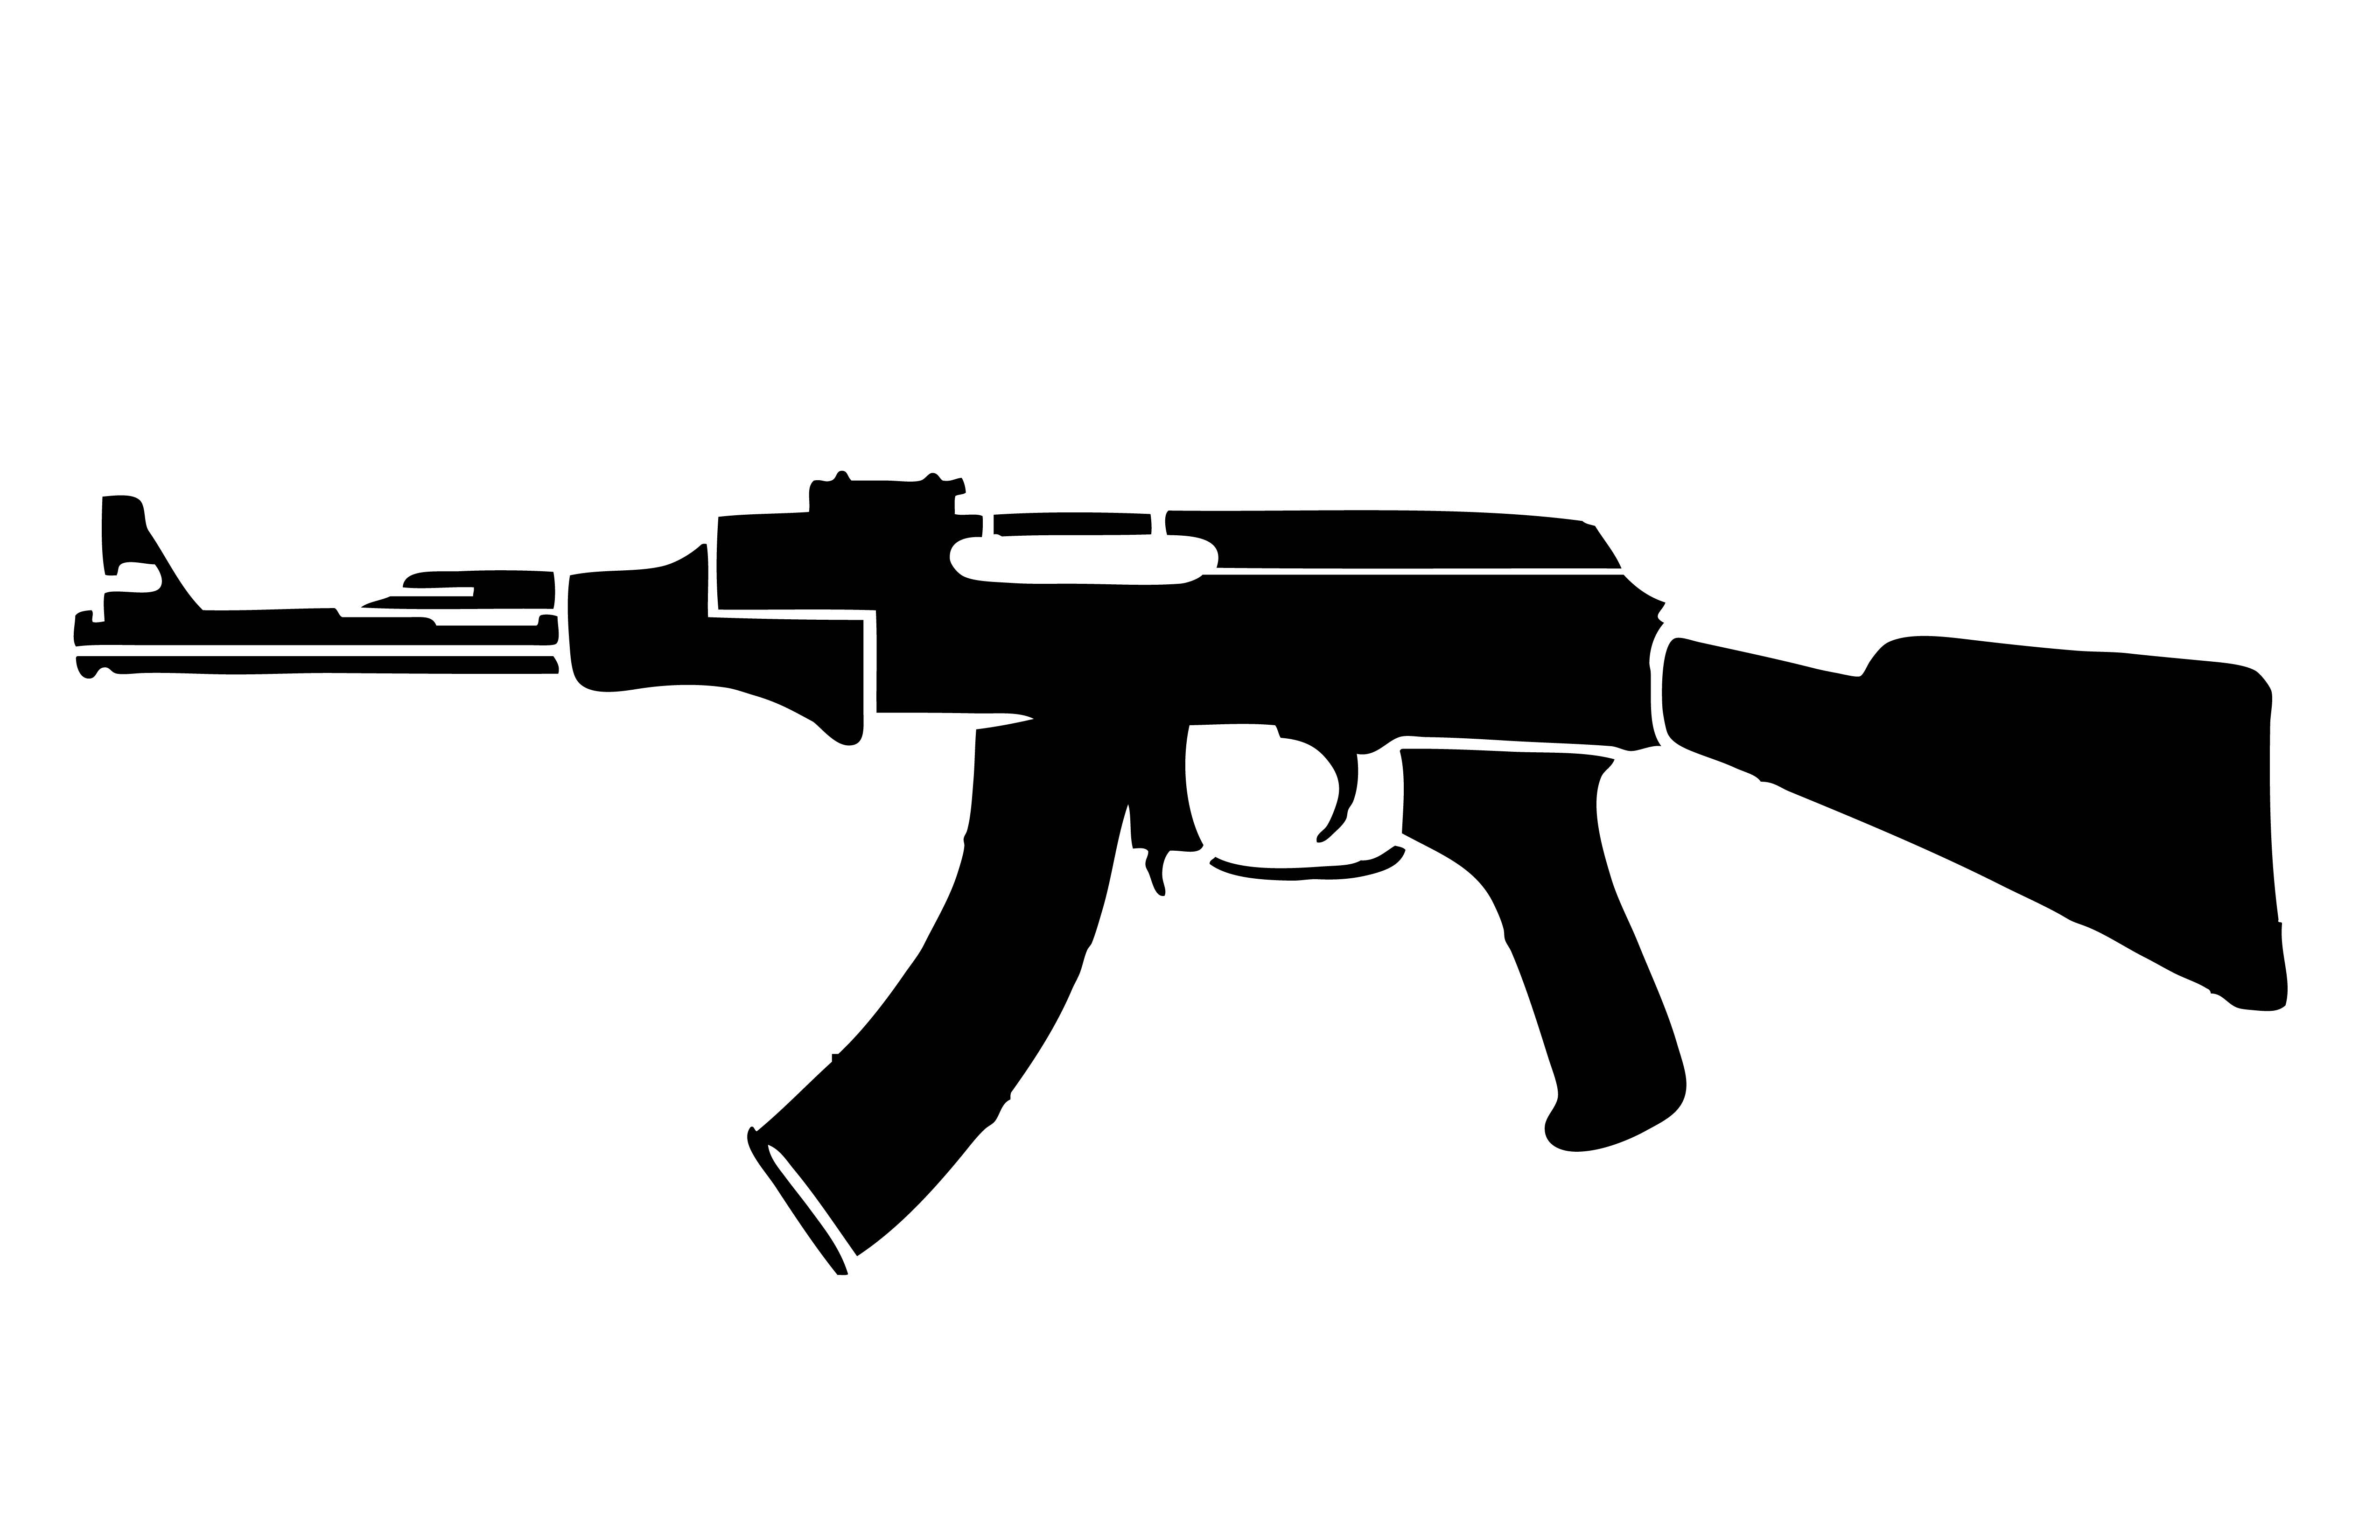 Ak 47 Stencil Original By Car54 On Deviantart